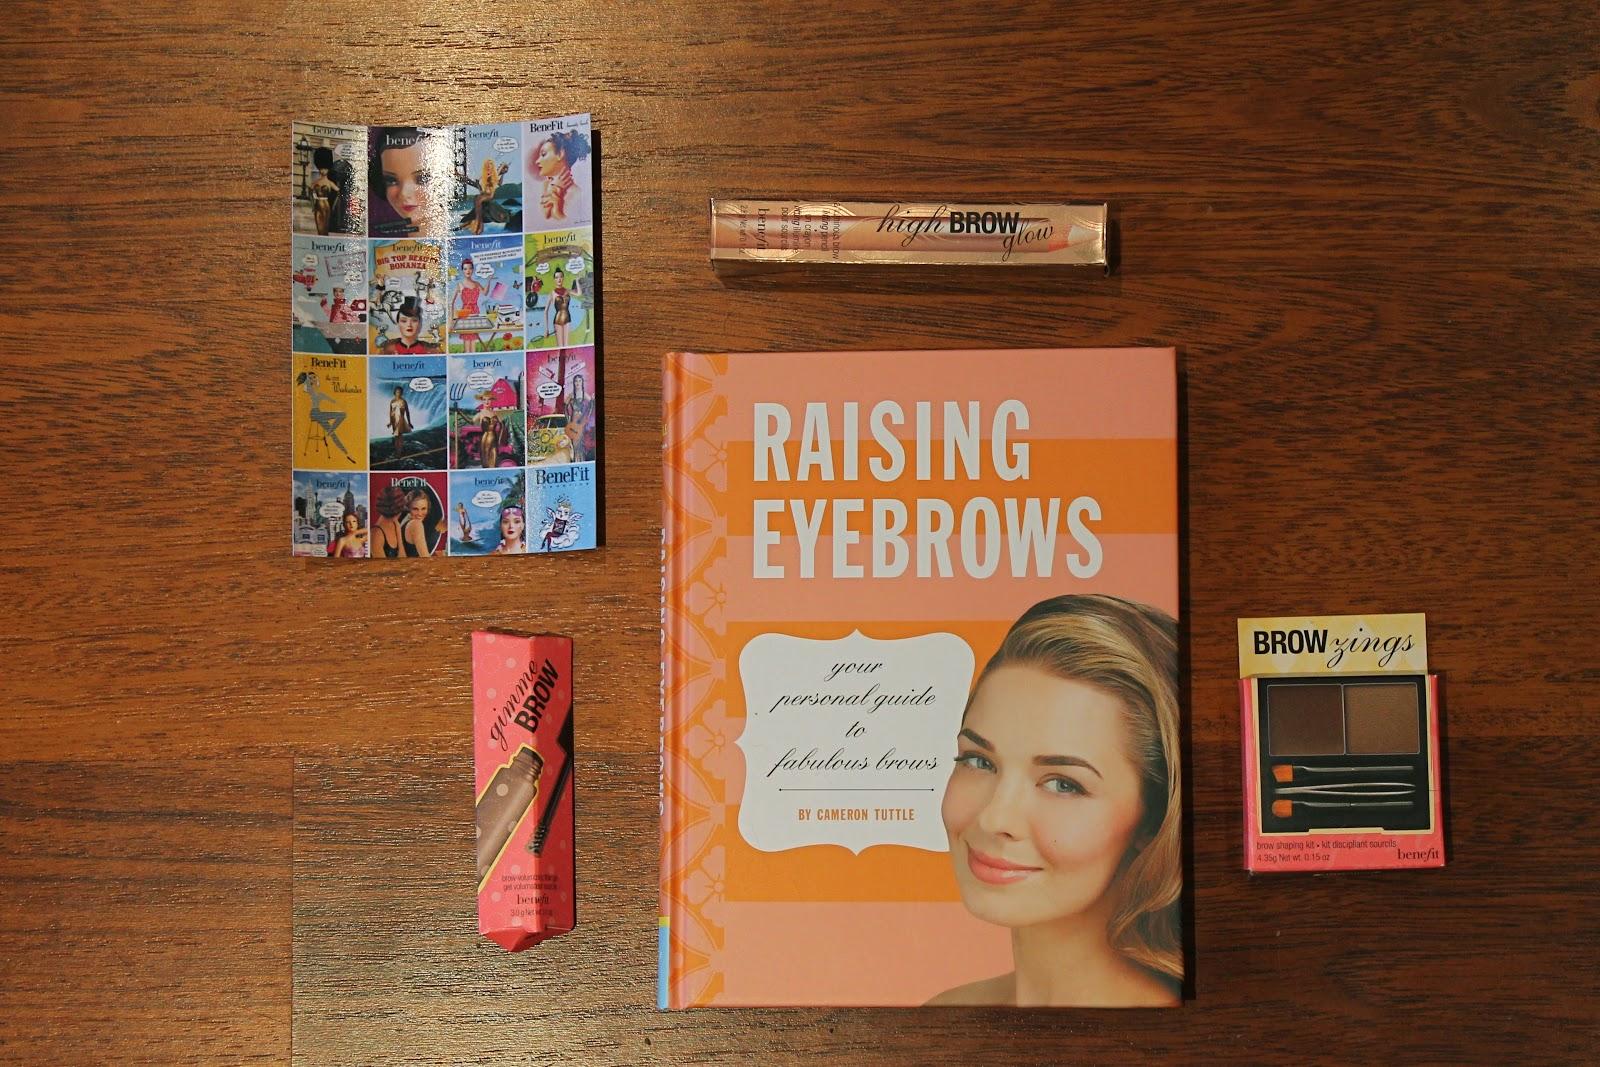 Benefit raising eyebrows book browzings gimmie brow high brow blogger